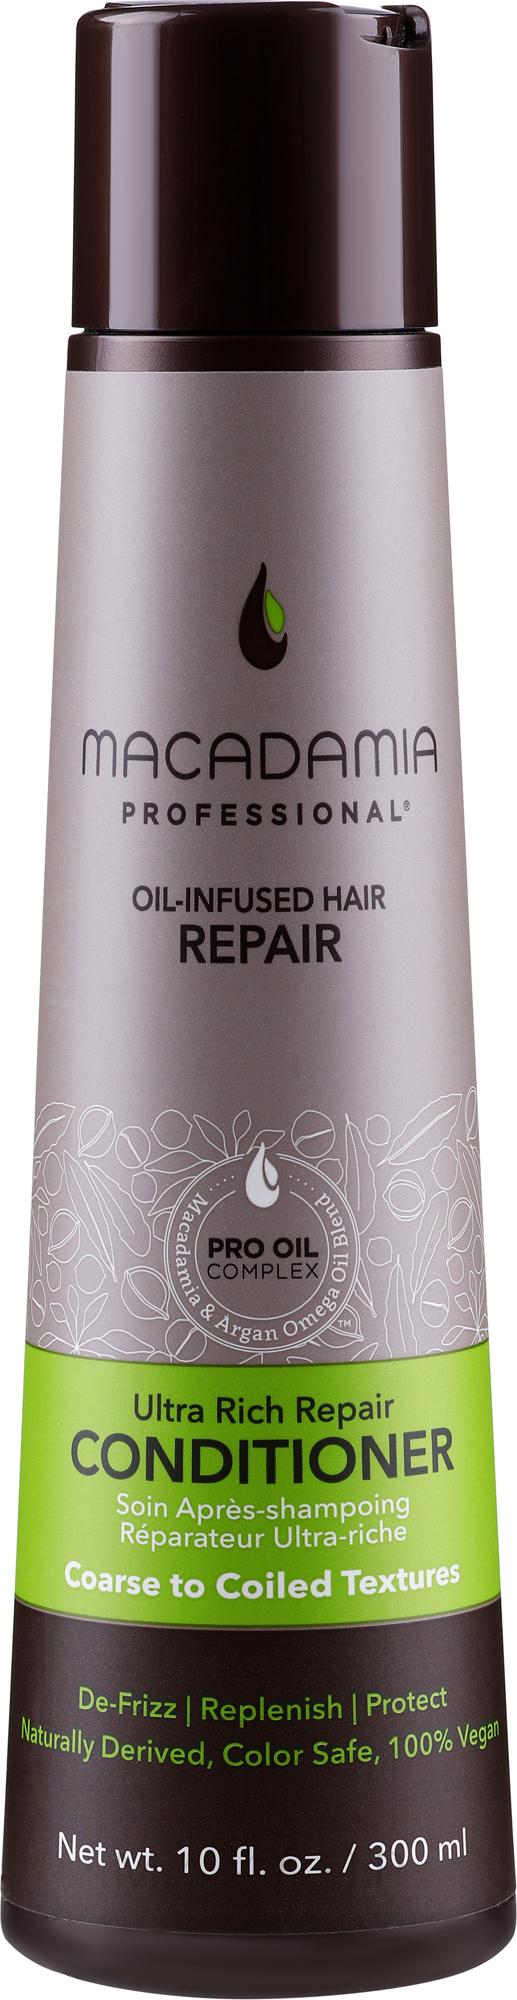 Conditioner mit Macadamia und Argan Omega - Macadamia Professional Ultra Rich Repair Conditioner — Bild 300 ml